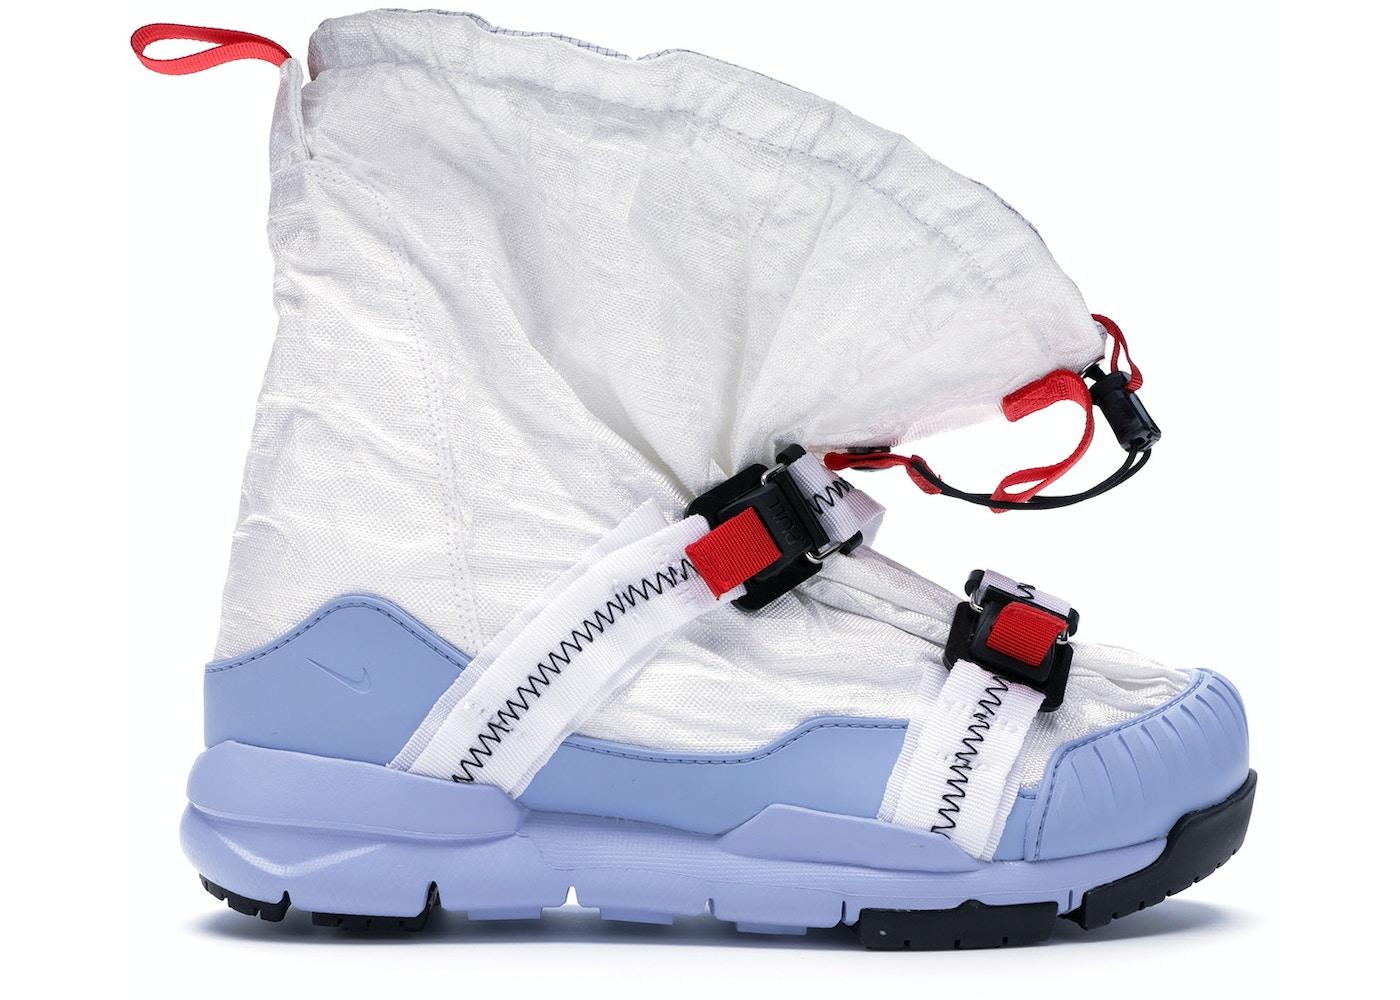 quality design 15496 805ef Nike Mars Yard Overshoe Tom Sachs